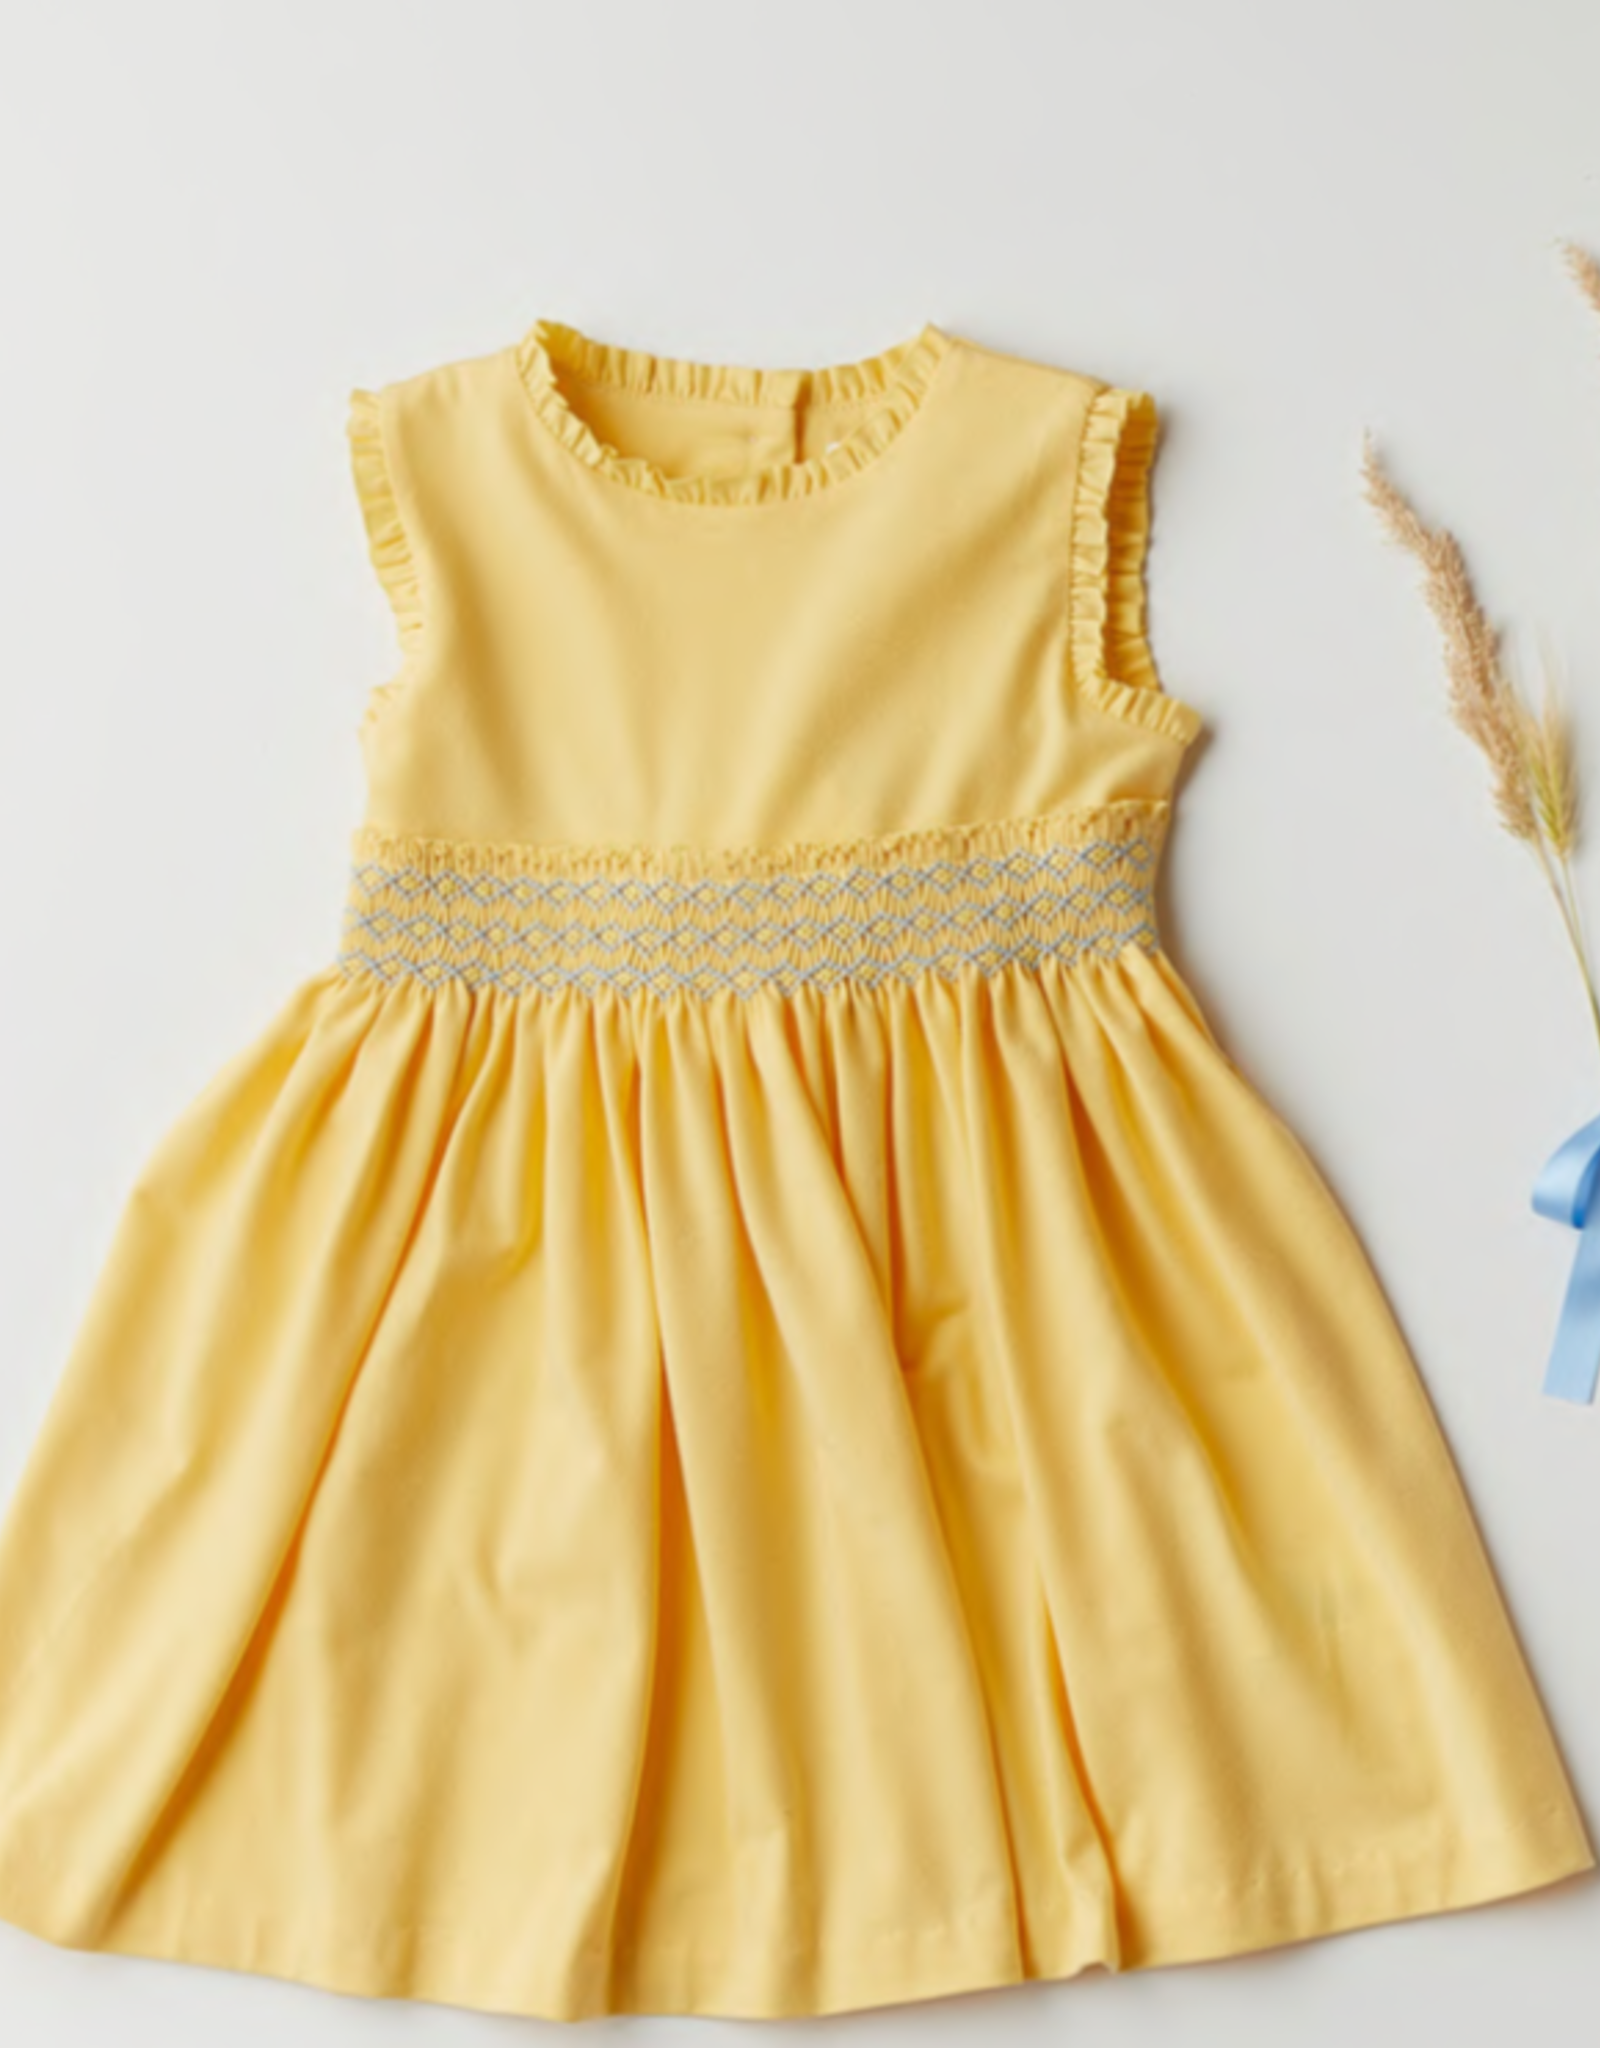 MALVI & CO MALVI & CO Geel kleedje blauw detail